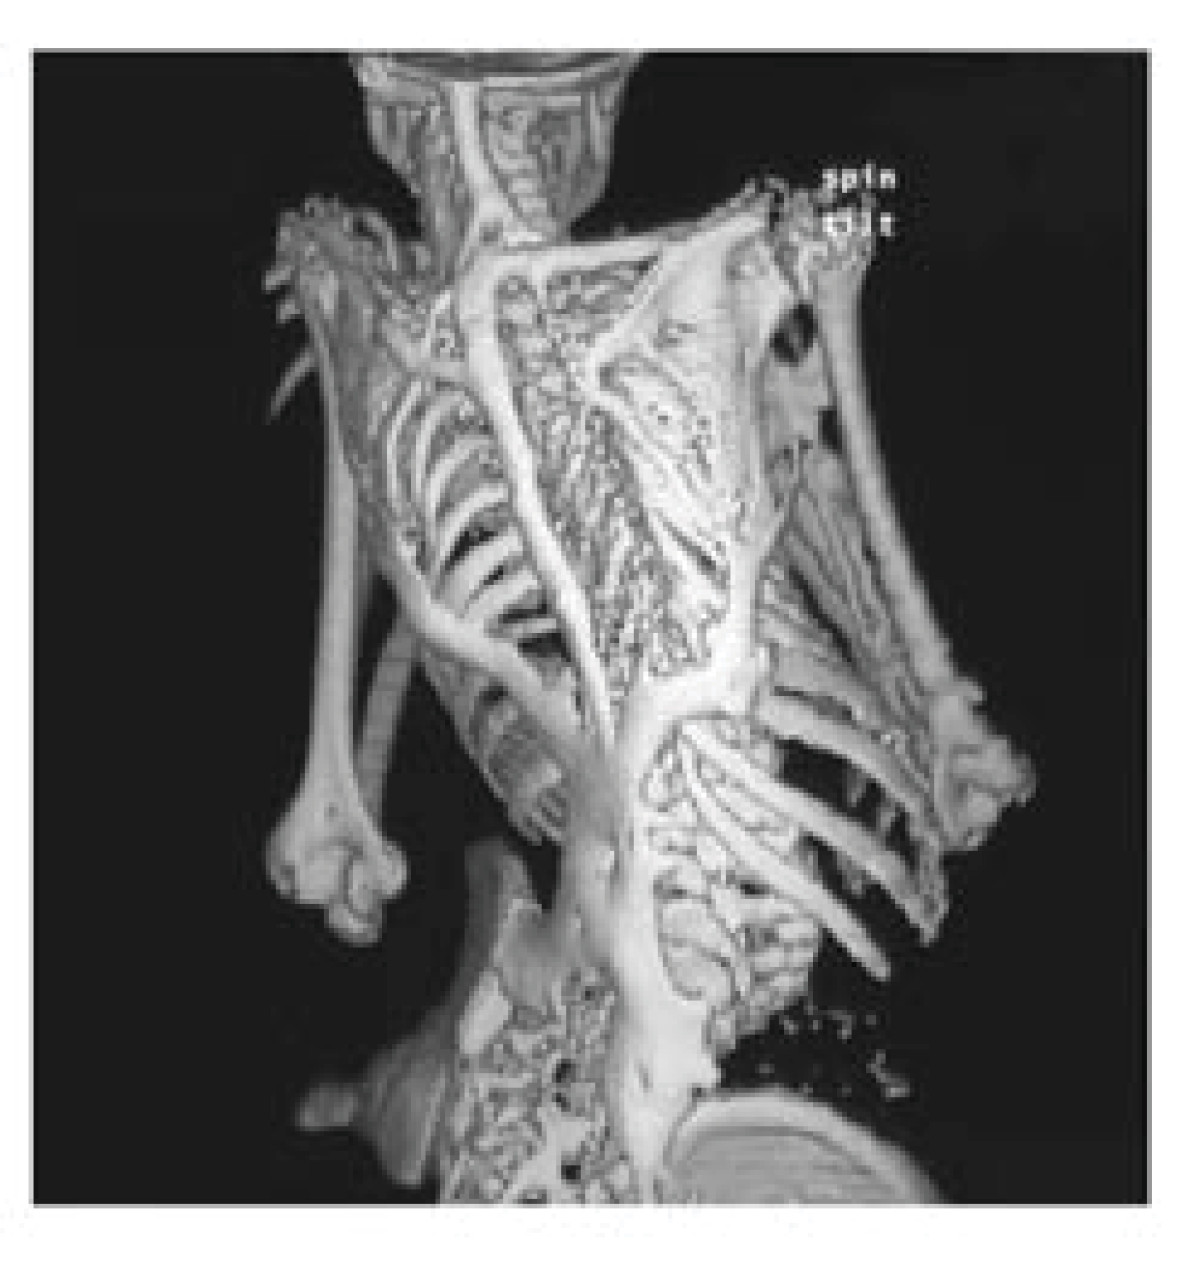 Fibrodysplasia Ossificans Progressiva: Clinical and Genetic